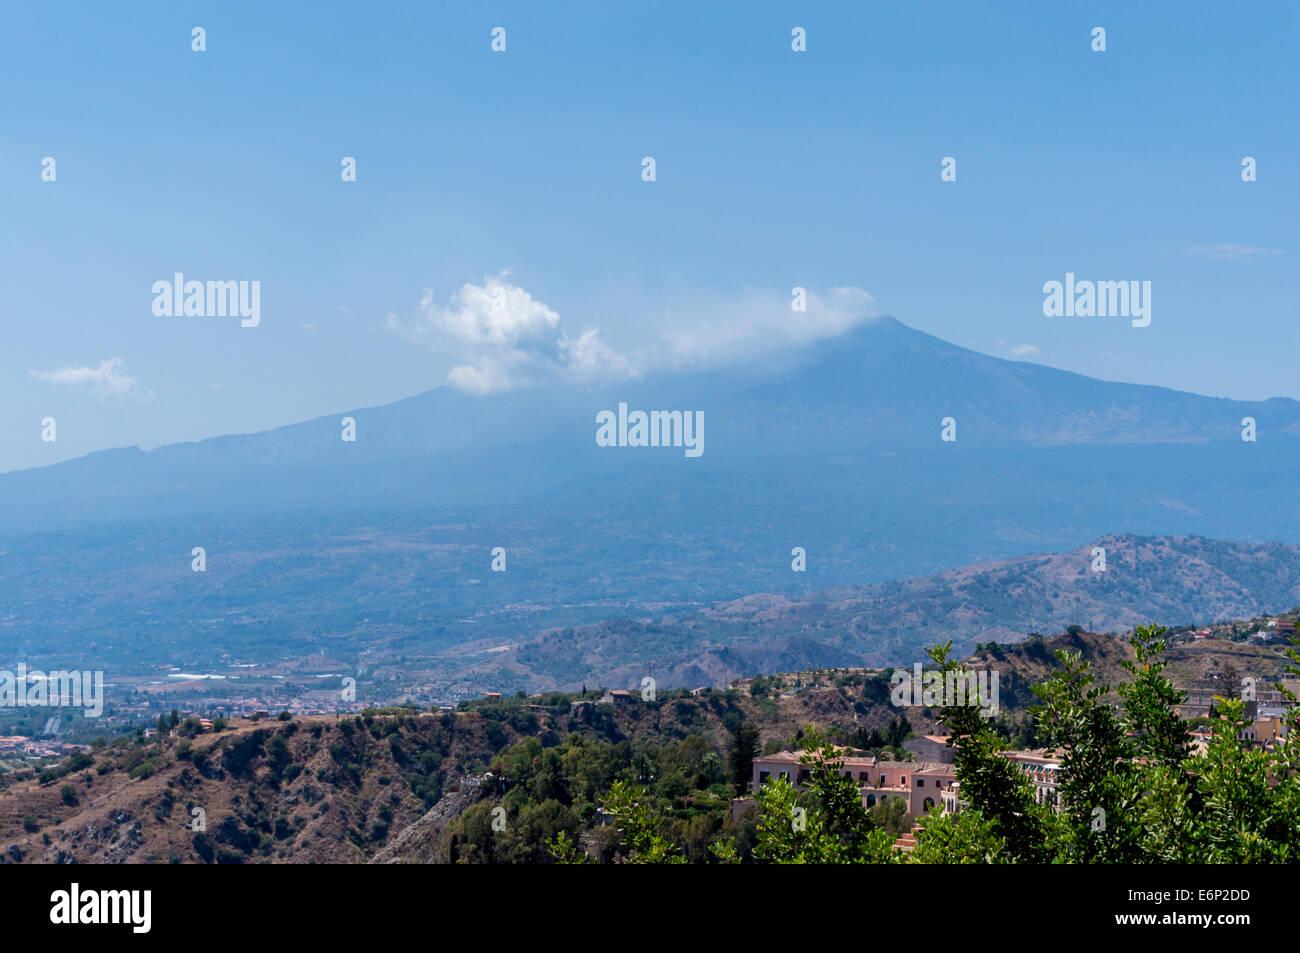 View of smoking Mount Etna - Stock Image